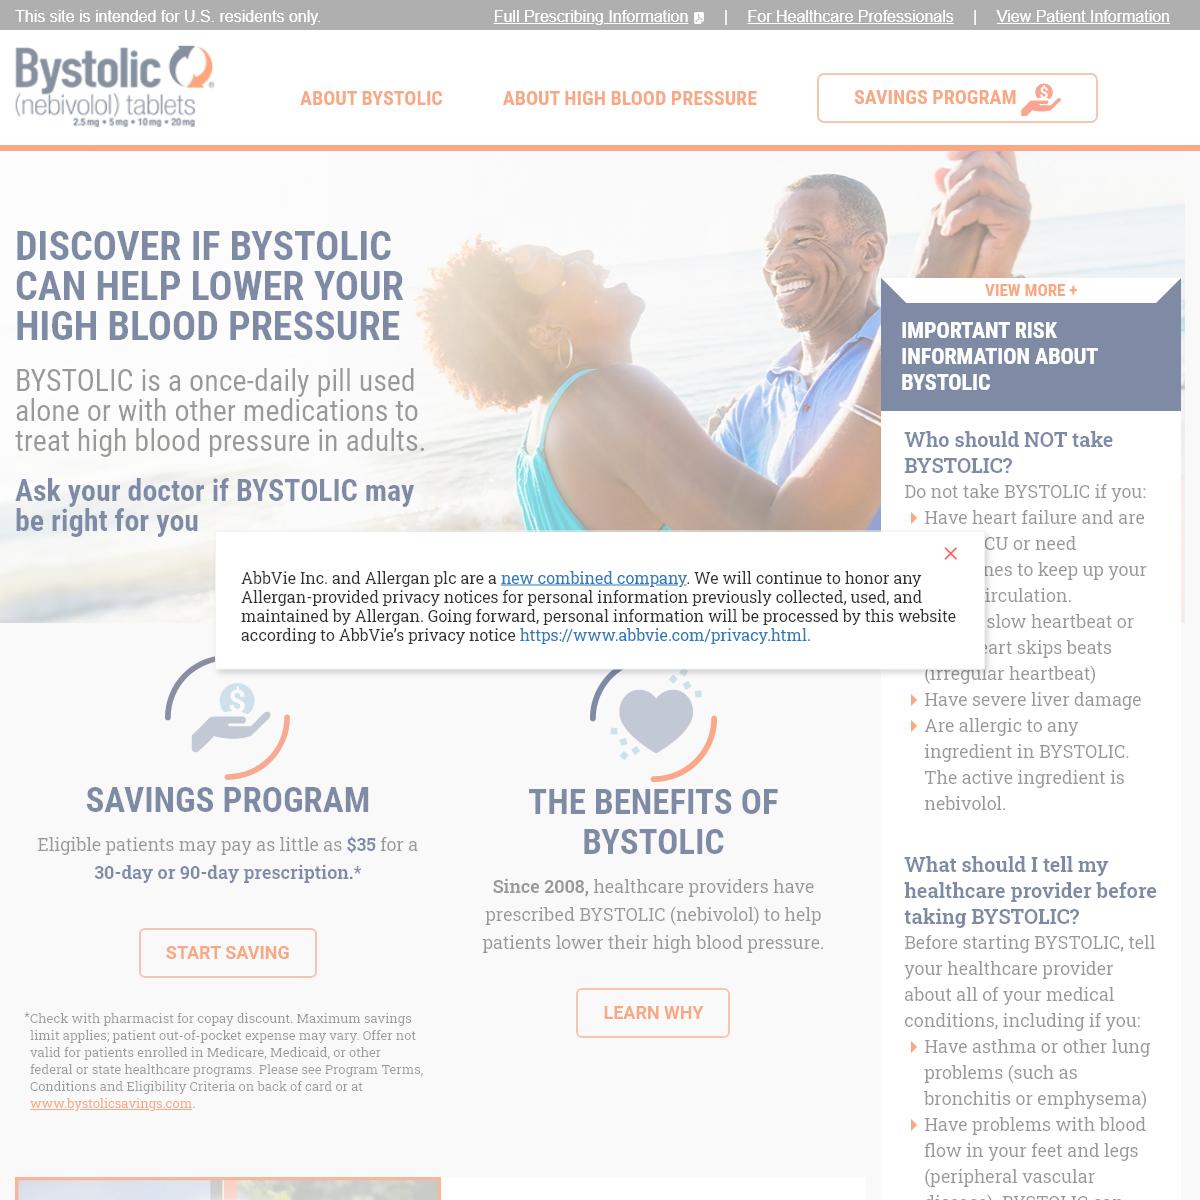 High Blood Pressure Treatment - BYSTOLIC® (nebivolol)